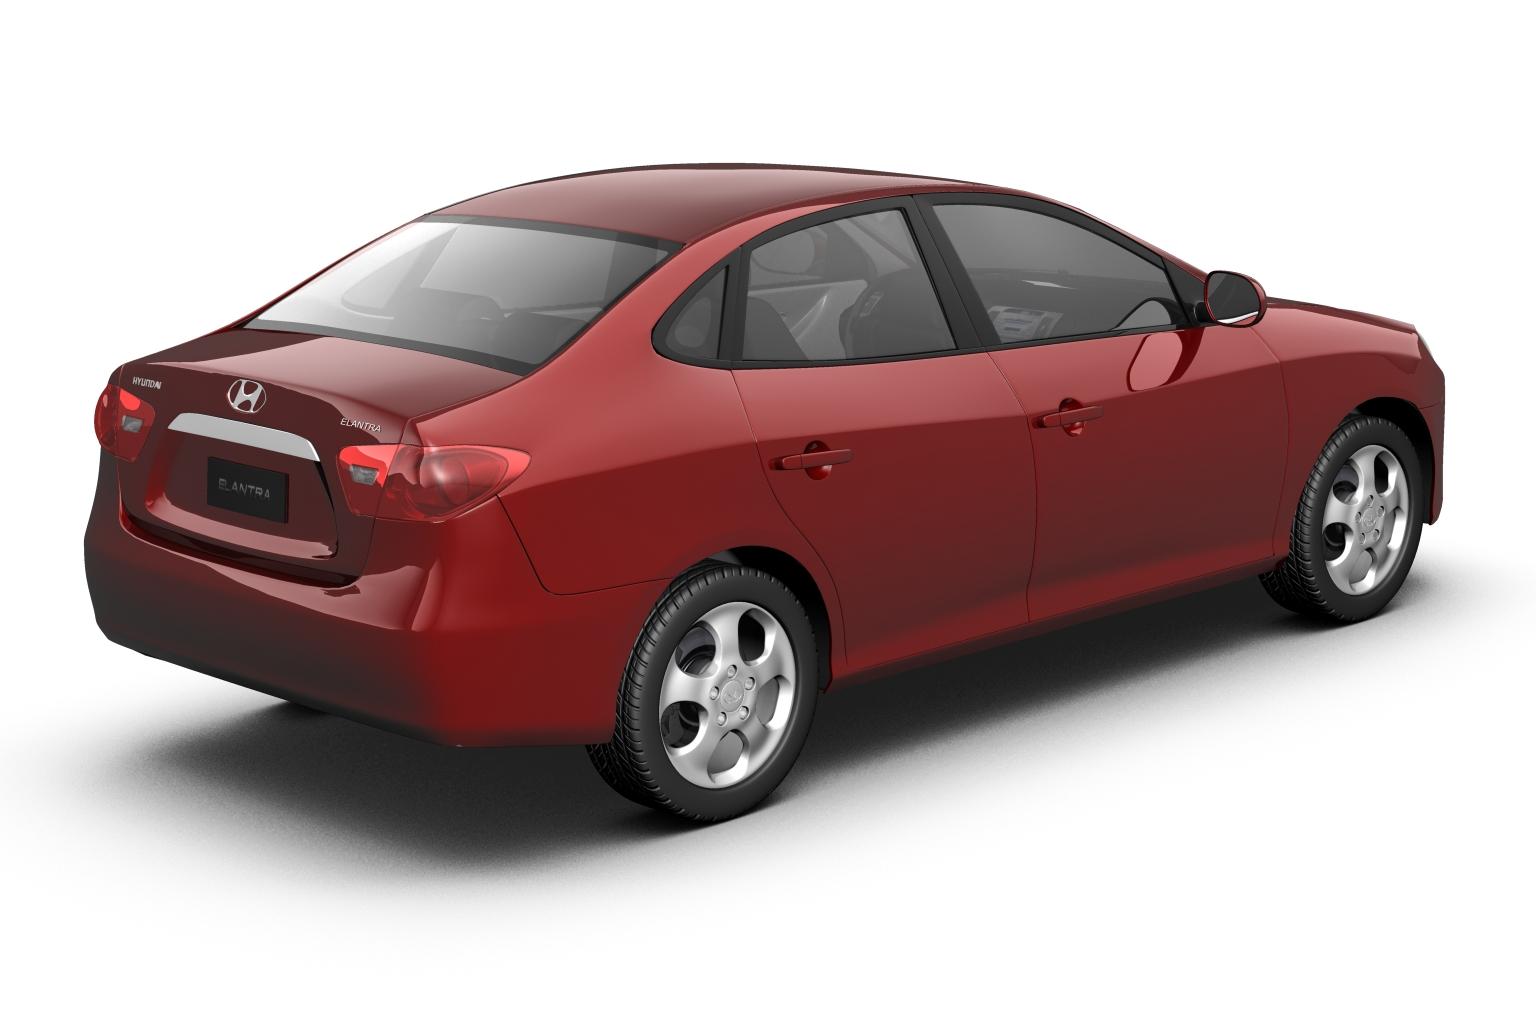 2007 hyundai elantra (avante) Model 3d 3ds max fbx lwo hrc xsi obj 205406